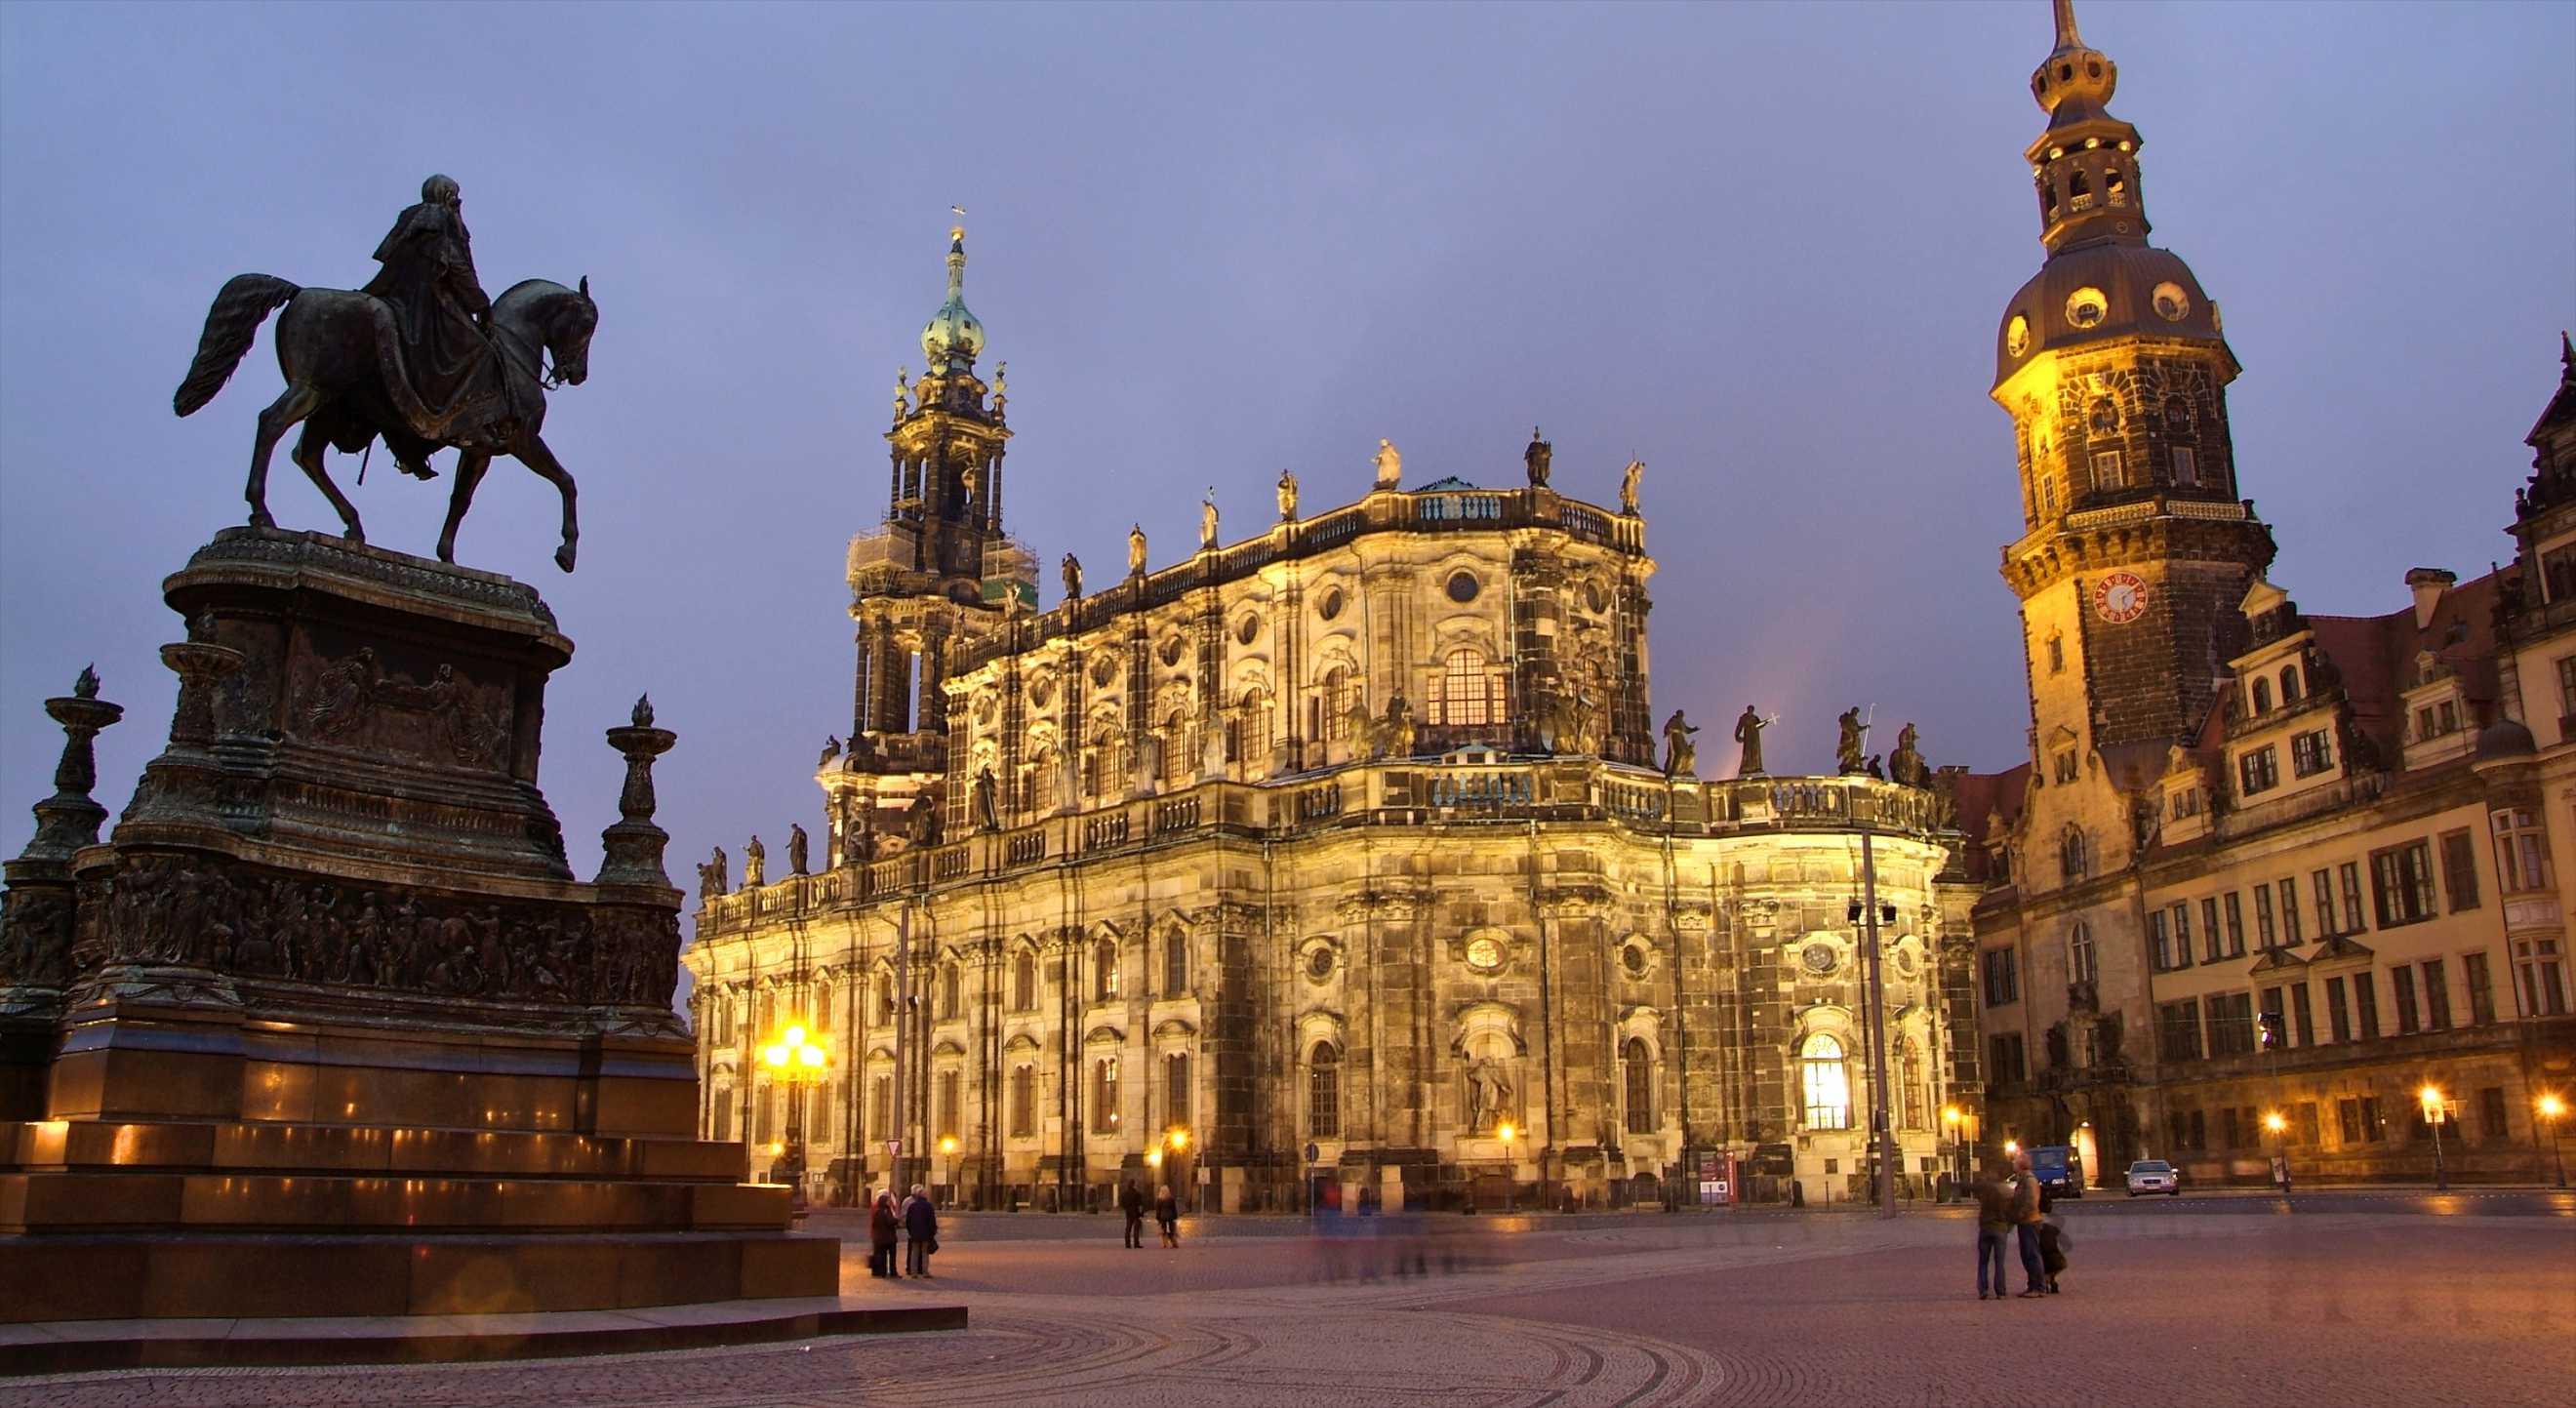 Hotel Dresden Gunstig Buchen Hotels Expedia De